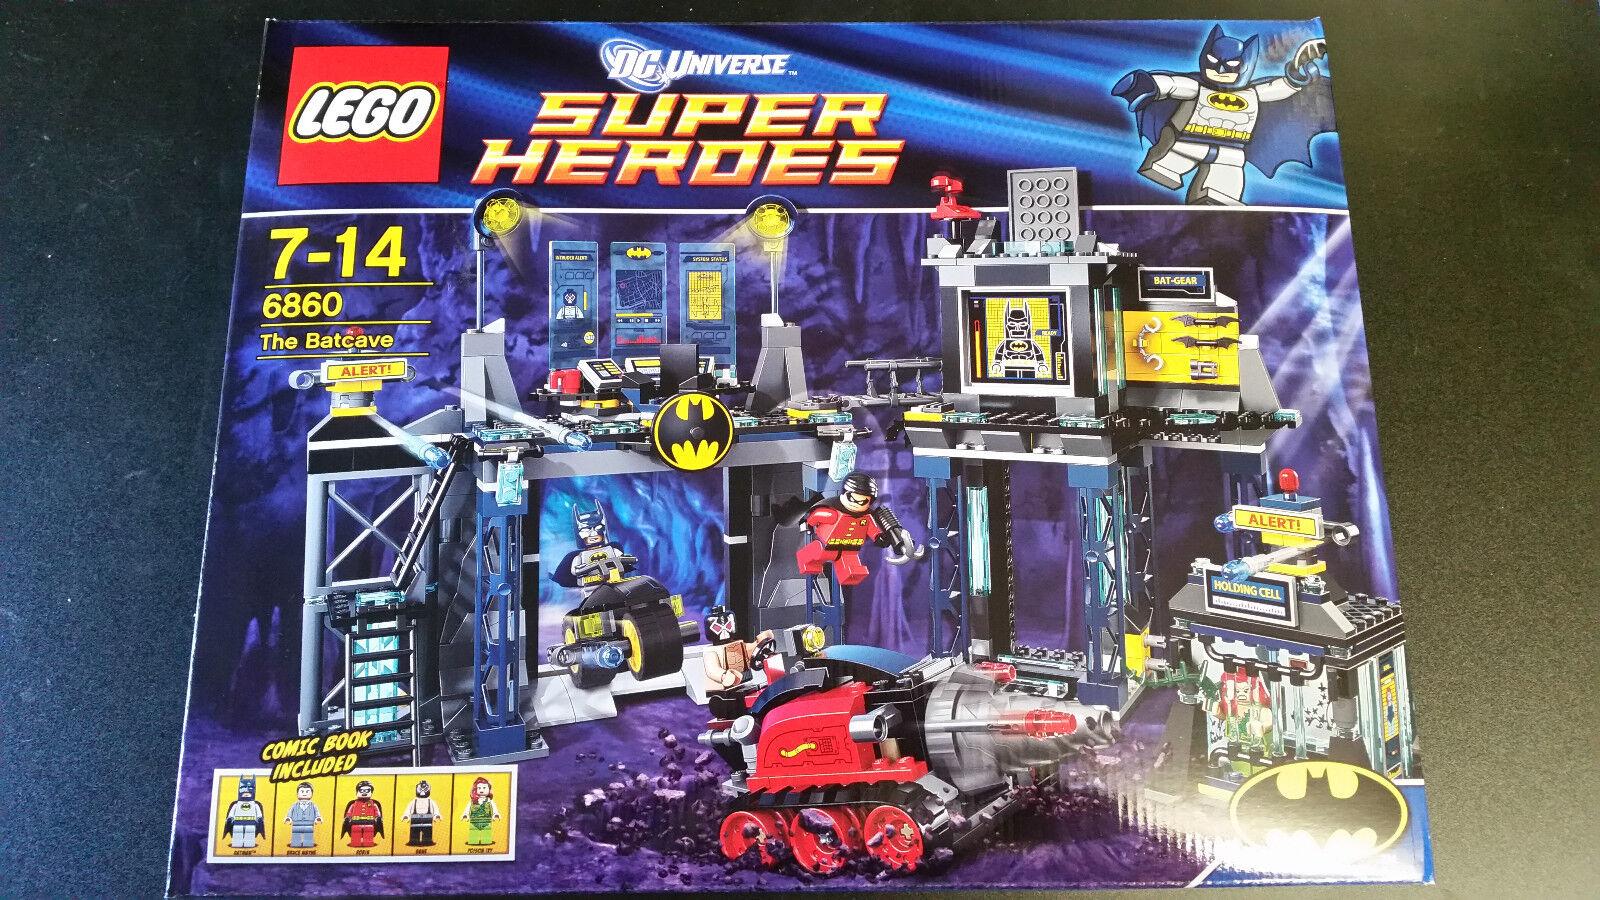 Lego Super Heroes The Batcave mercancía nueva 6860